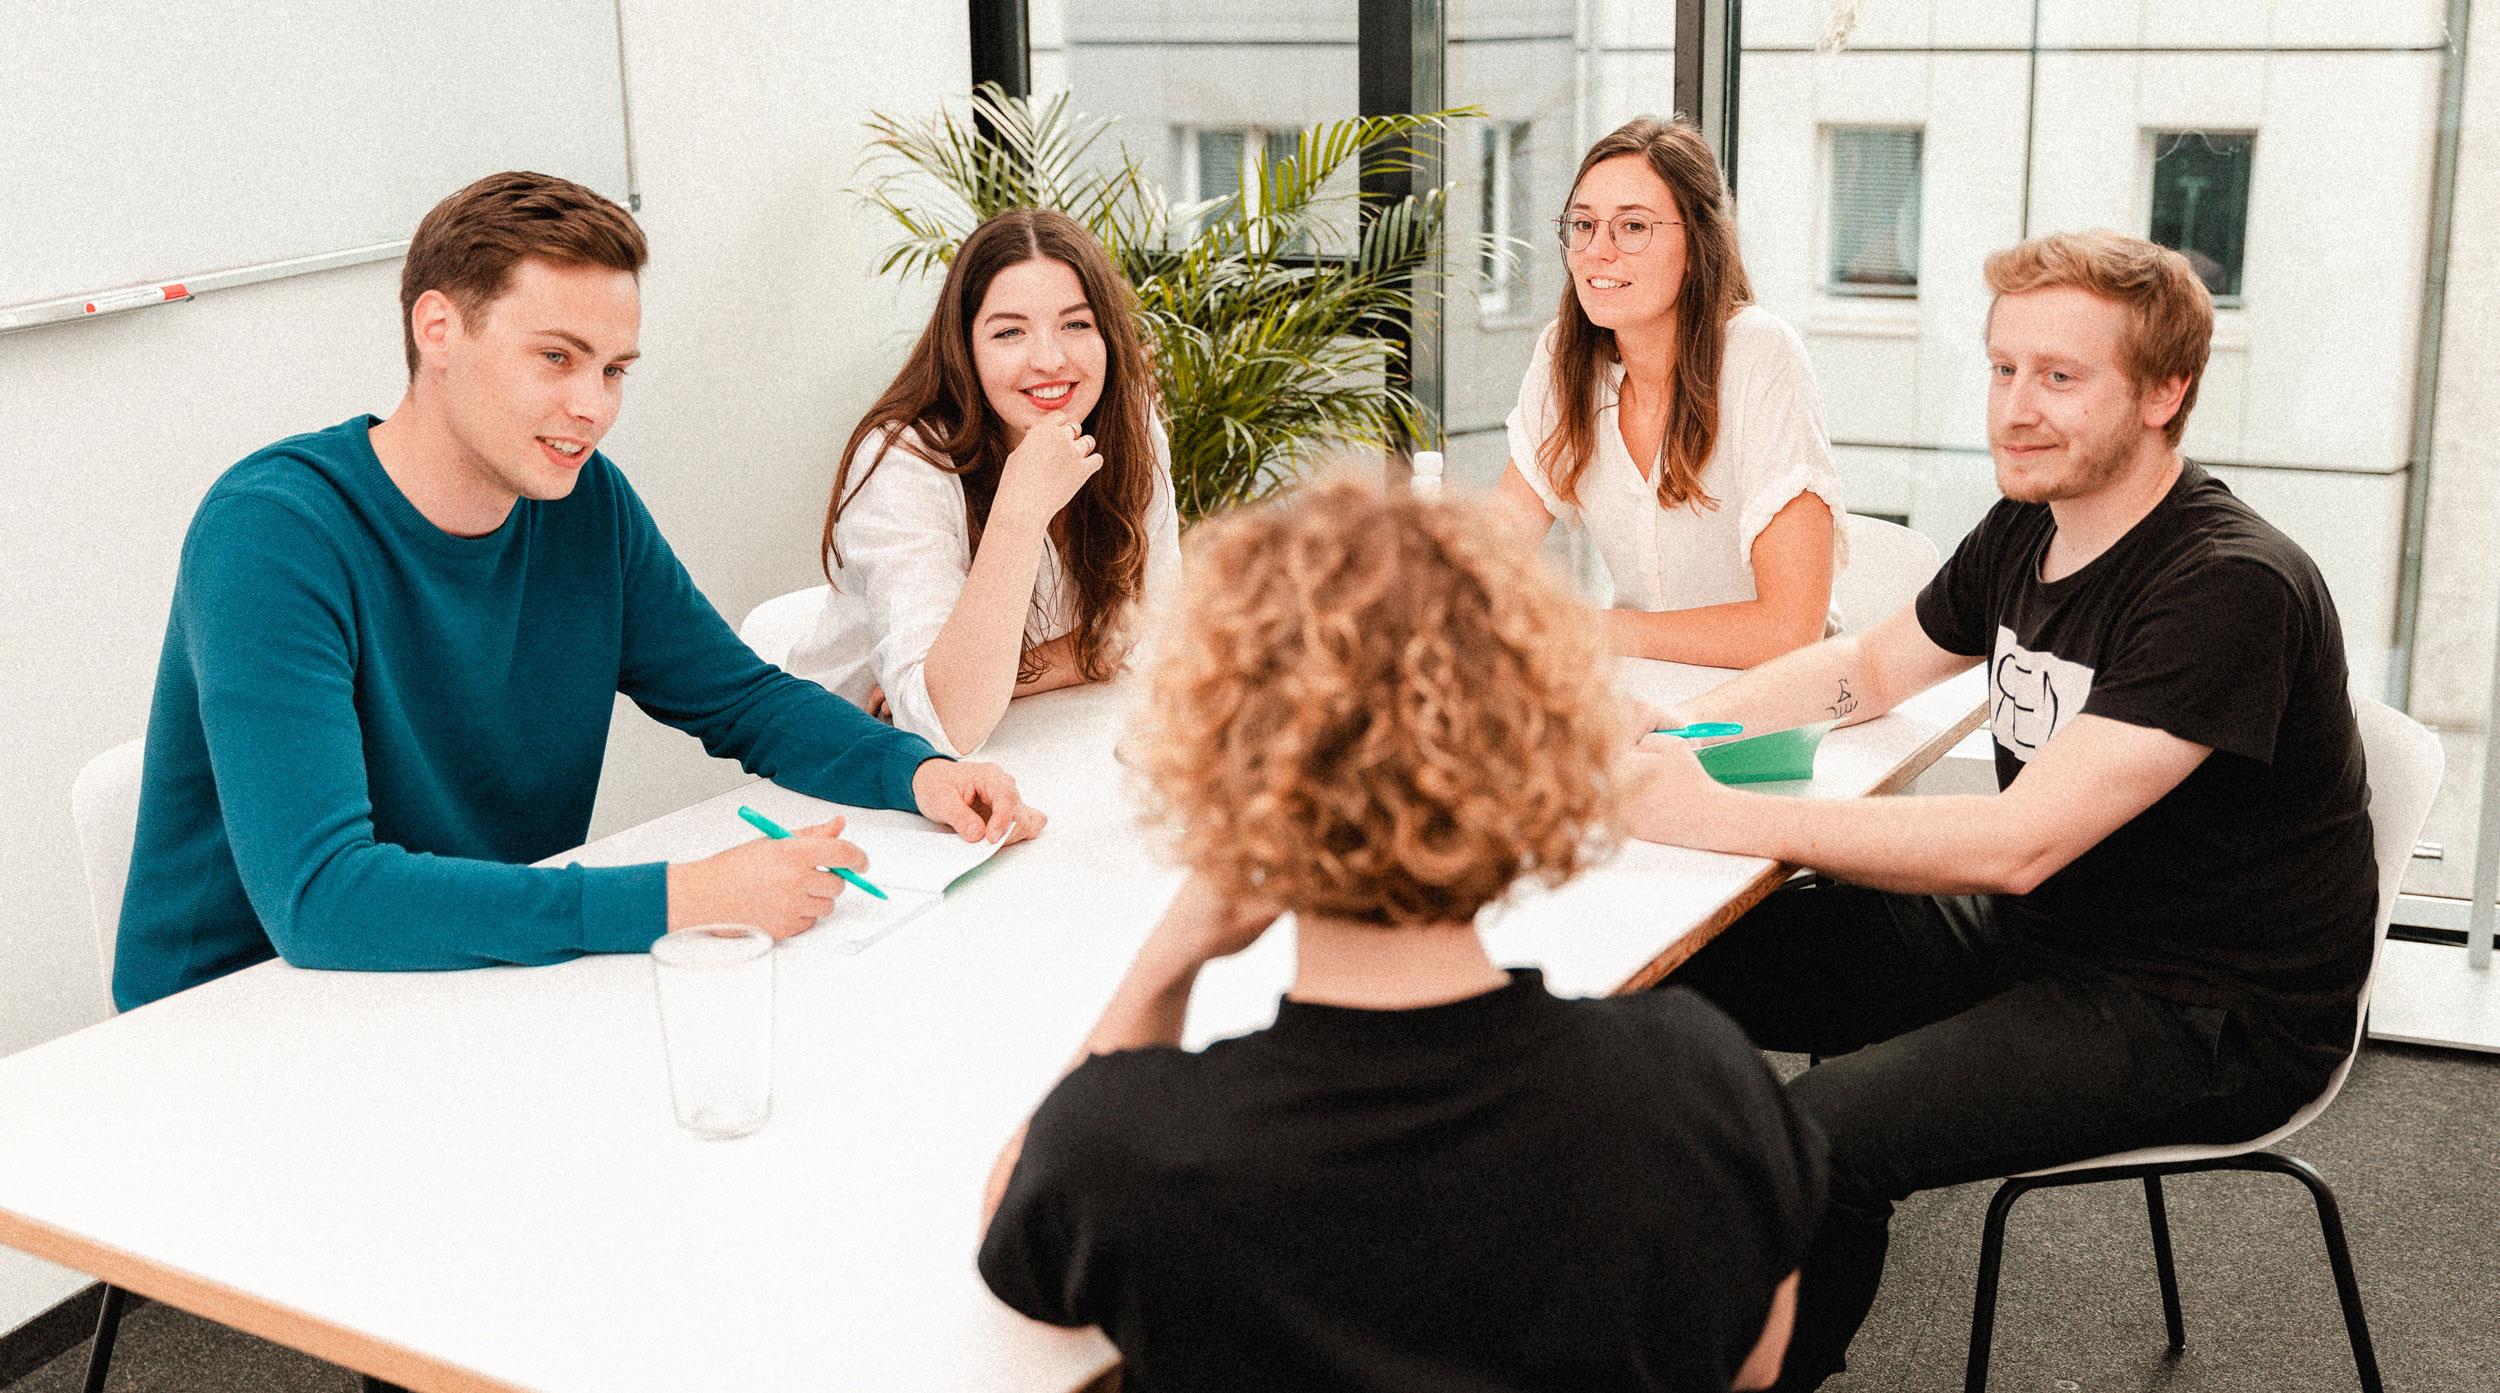 Gruppendiskussion Pflege